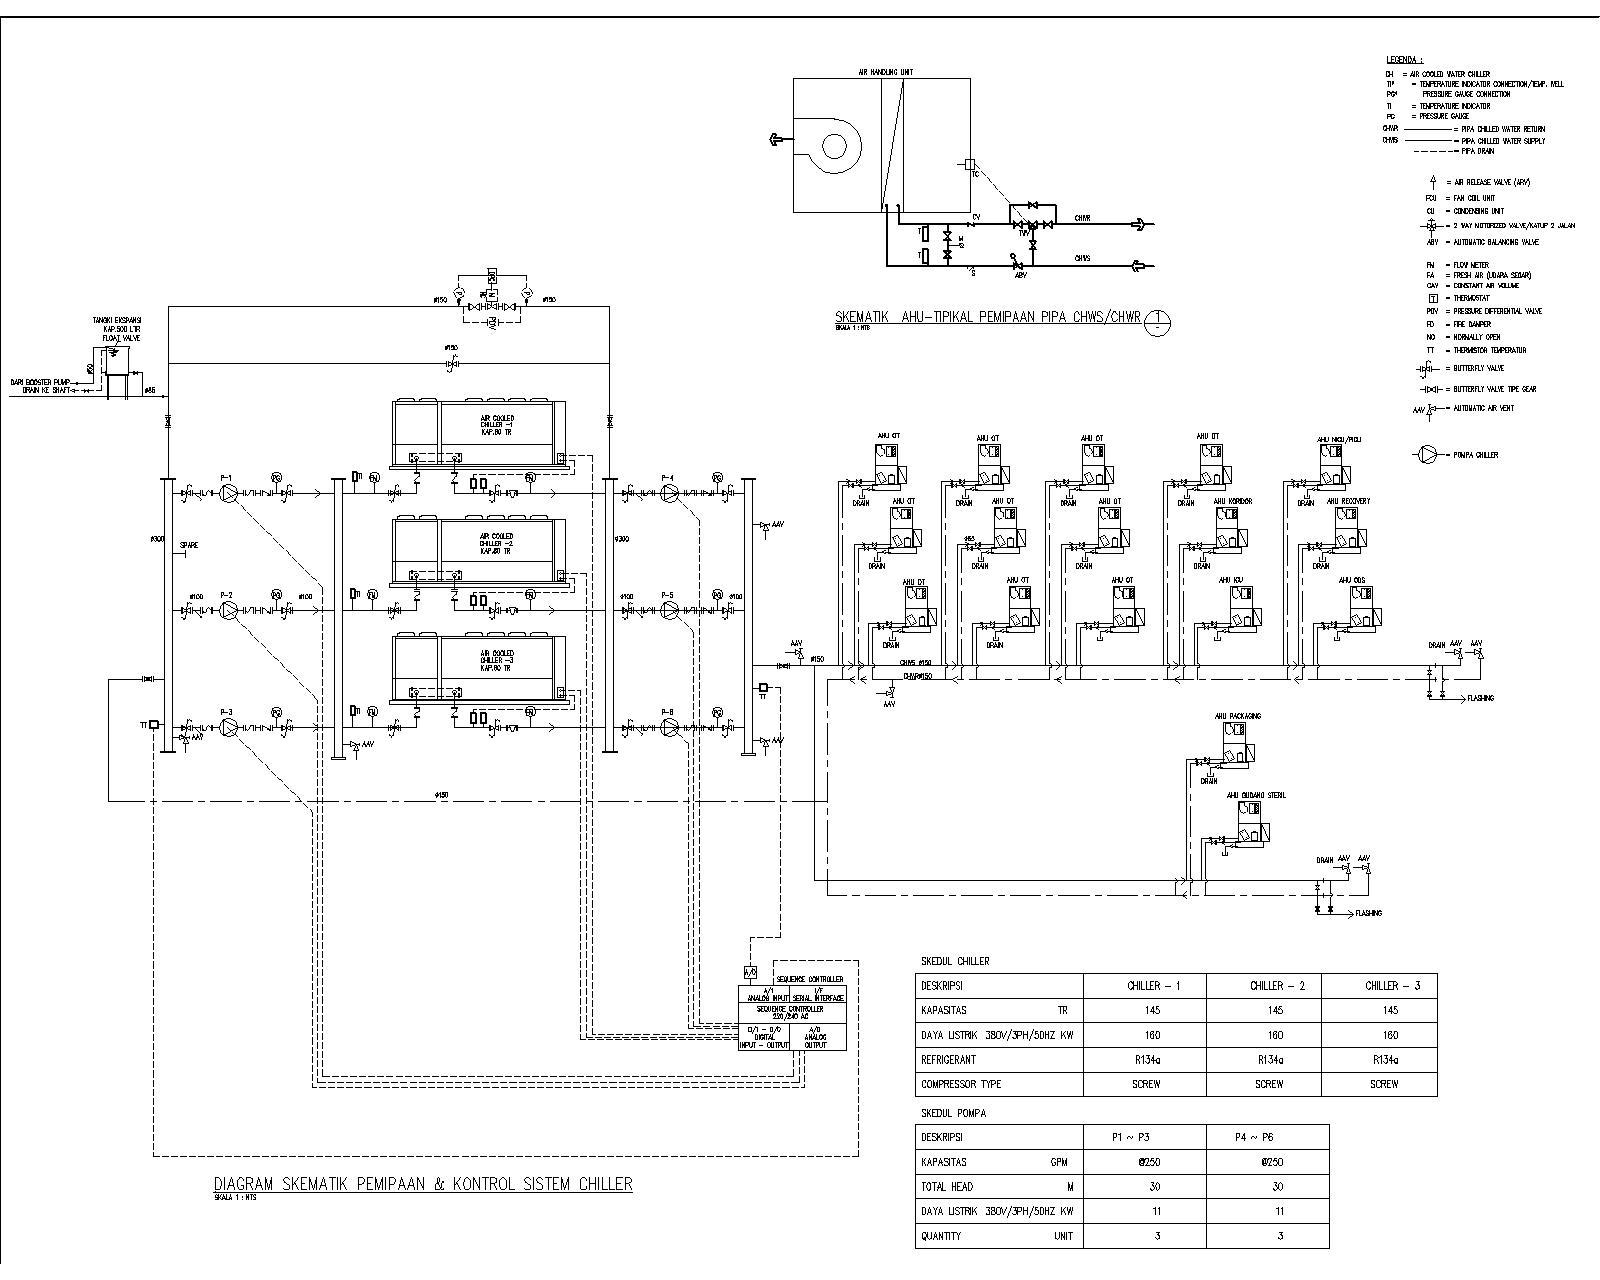 MEP Mekanikal Elektrikal Plambing: Contoh Skematik Pemipaan Chilled ...